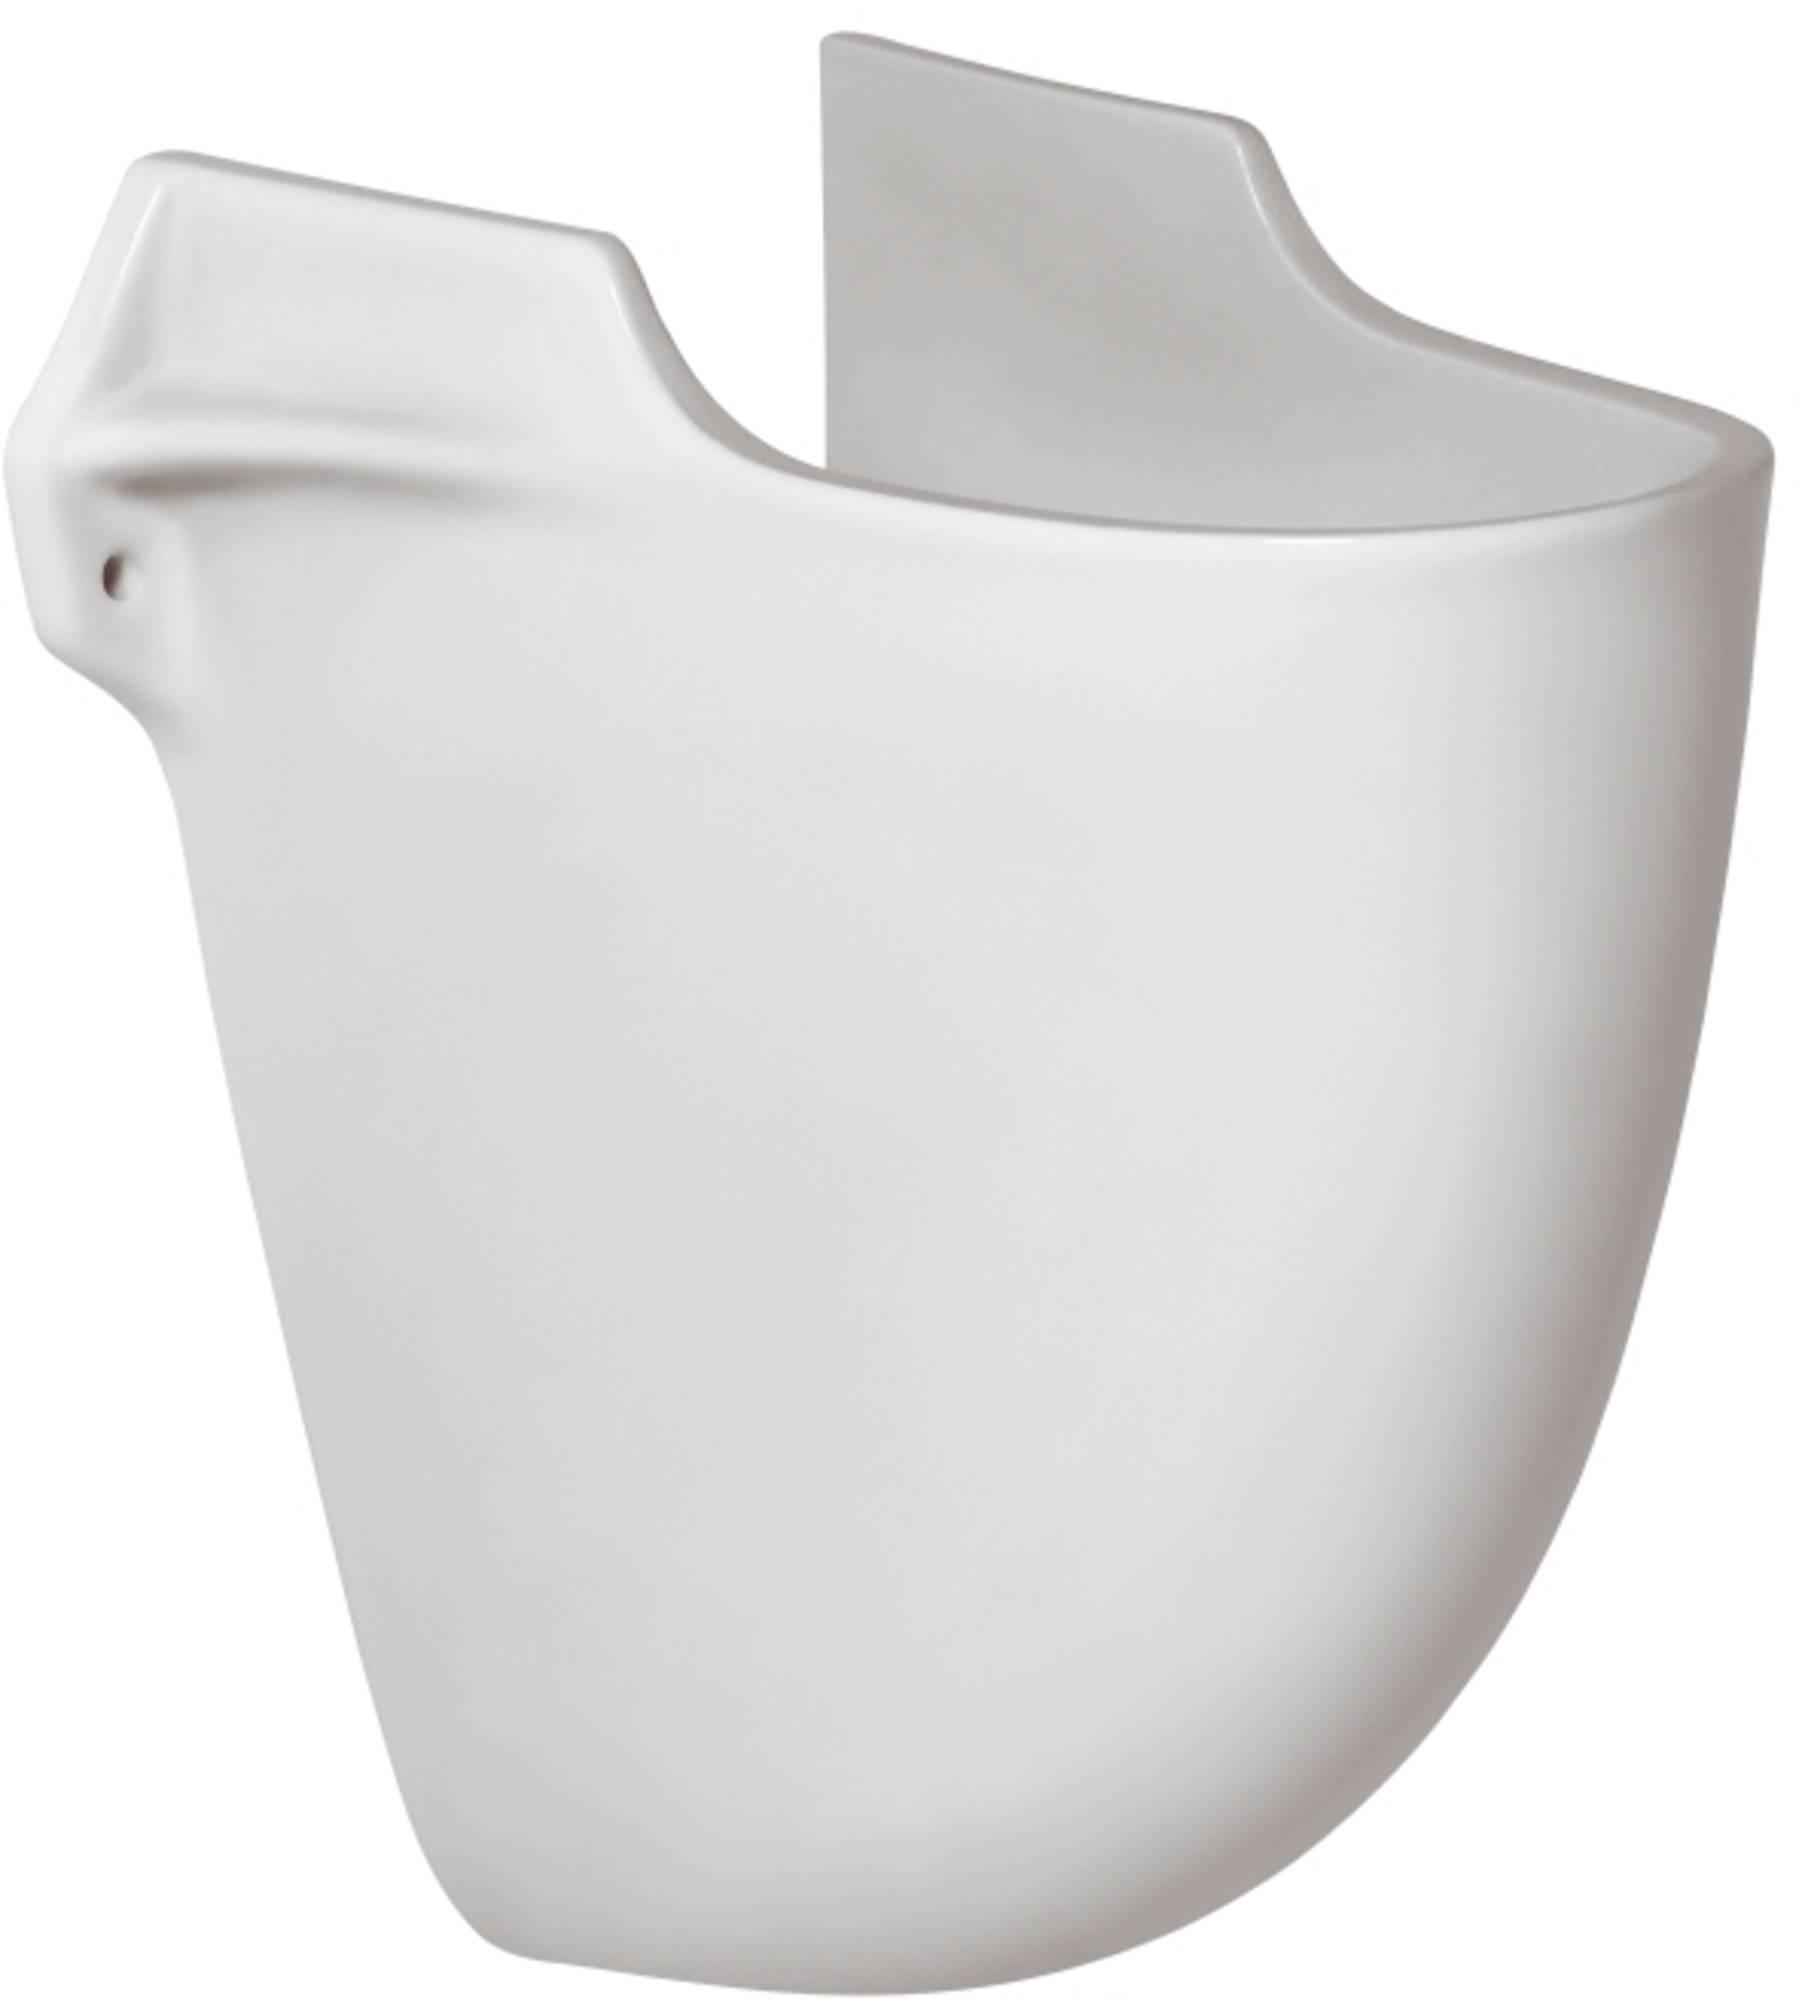 IDEAL STANDARD EUROVIT sifonkap voor ronde wastafel WIT (V921001)